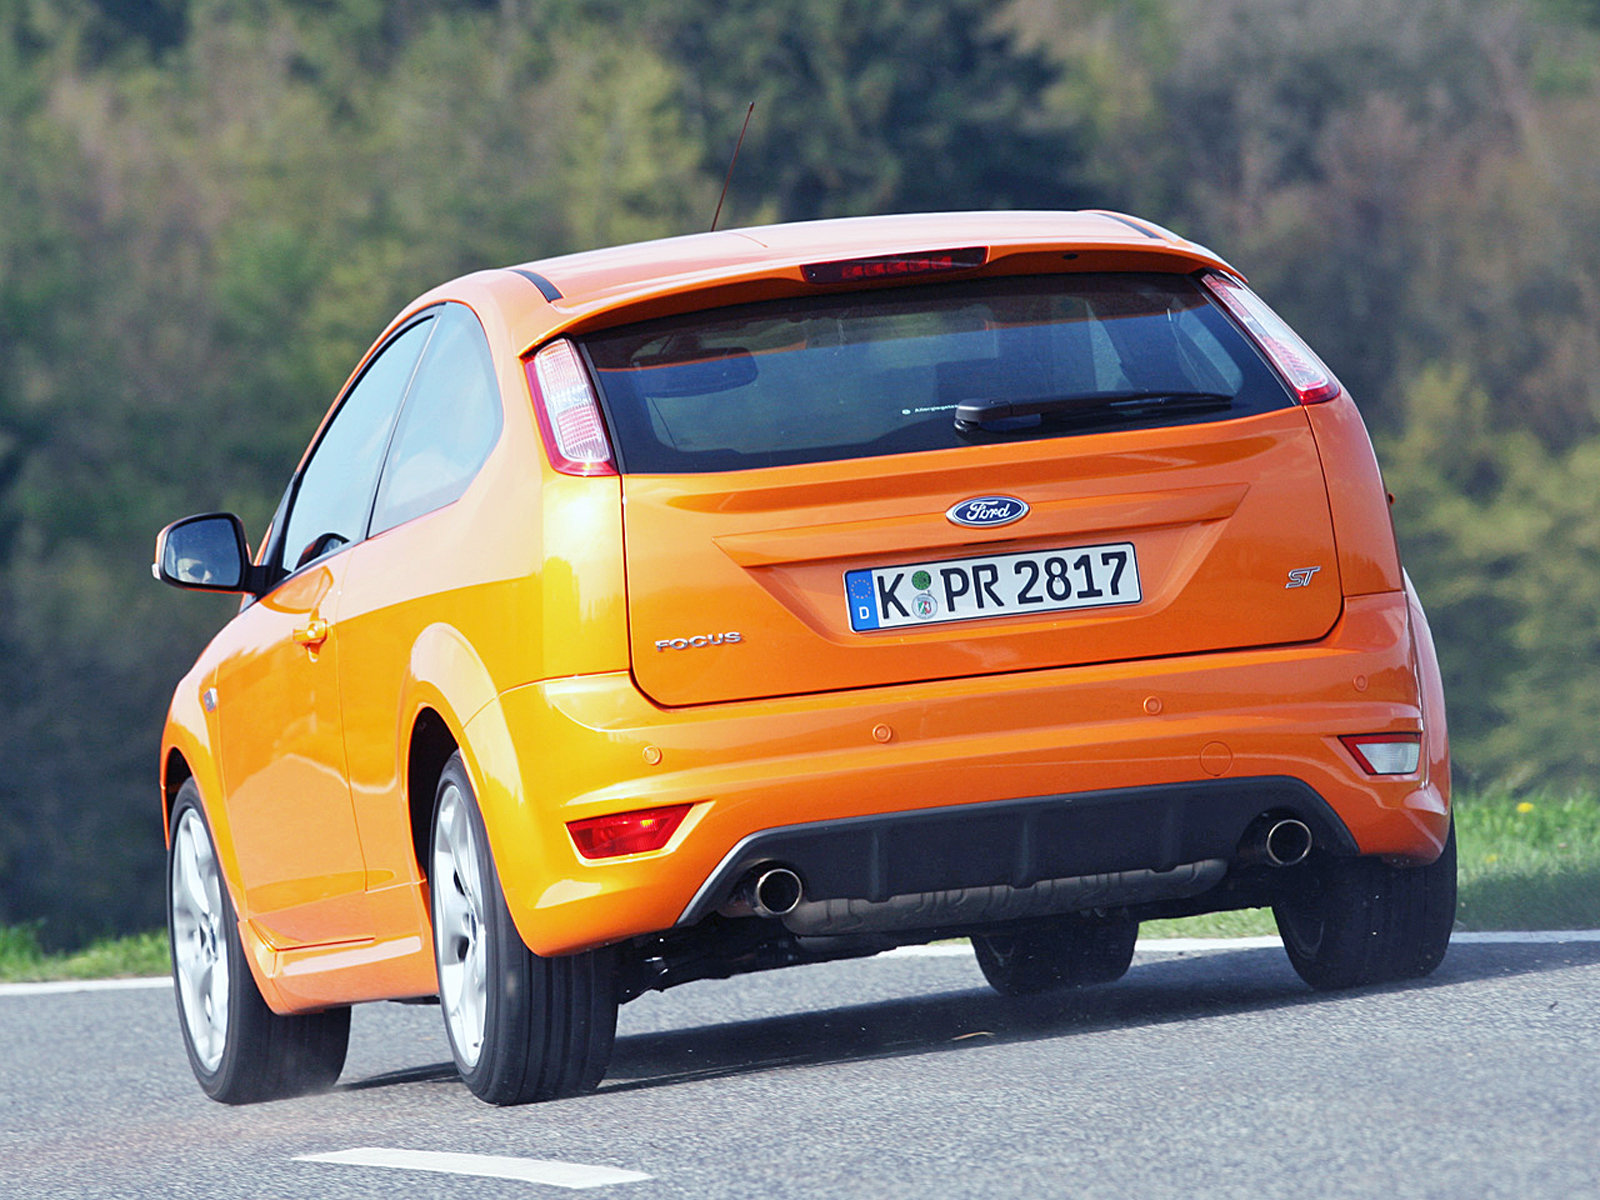 Ford Fiesta (Форд Фиеста) - цена, отзывы, характеристики ...